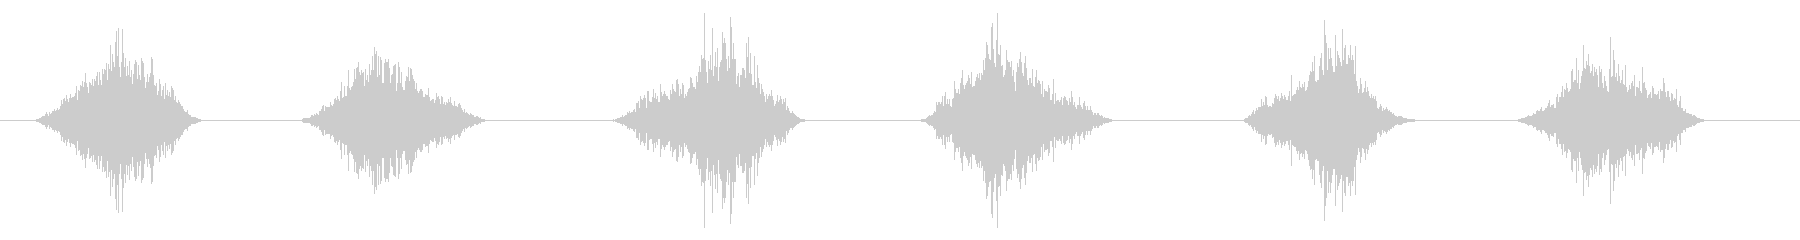 PC マウス ムーブ04-02(木)の未再生の波形